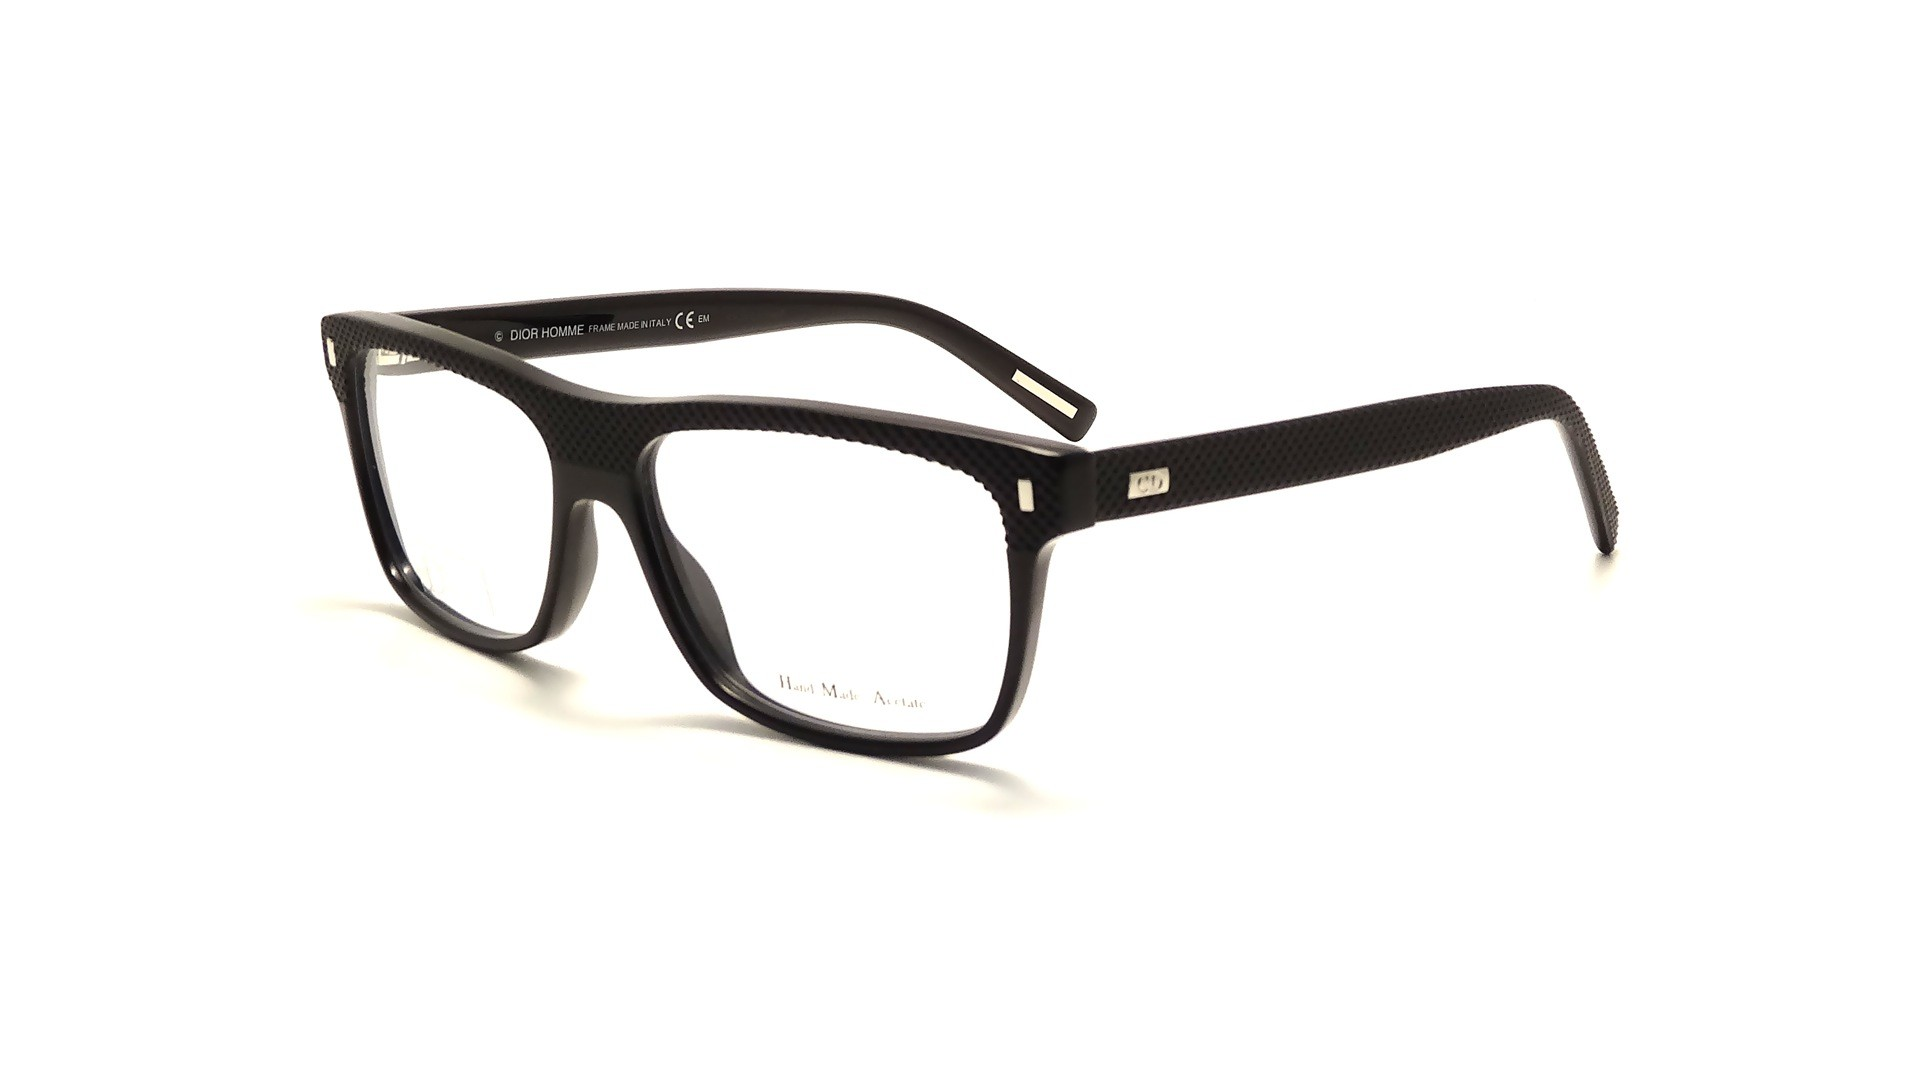 Glasses Frames Recto Or Quiapo : Eye glasses Dior Blacktie168 807 Black Medium